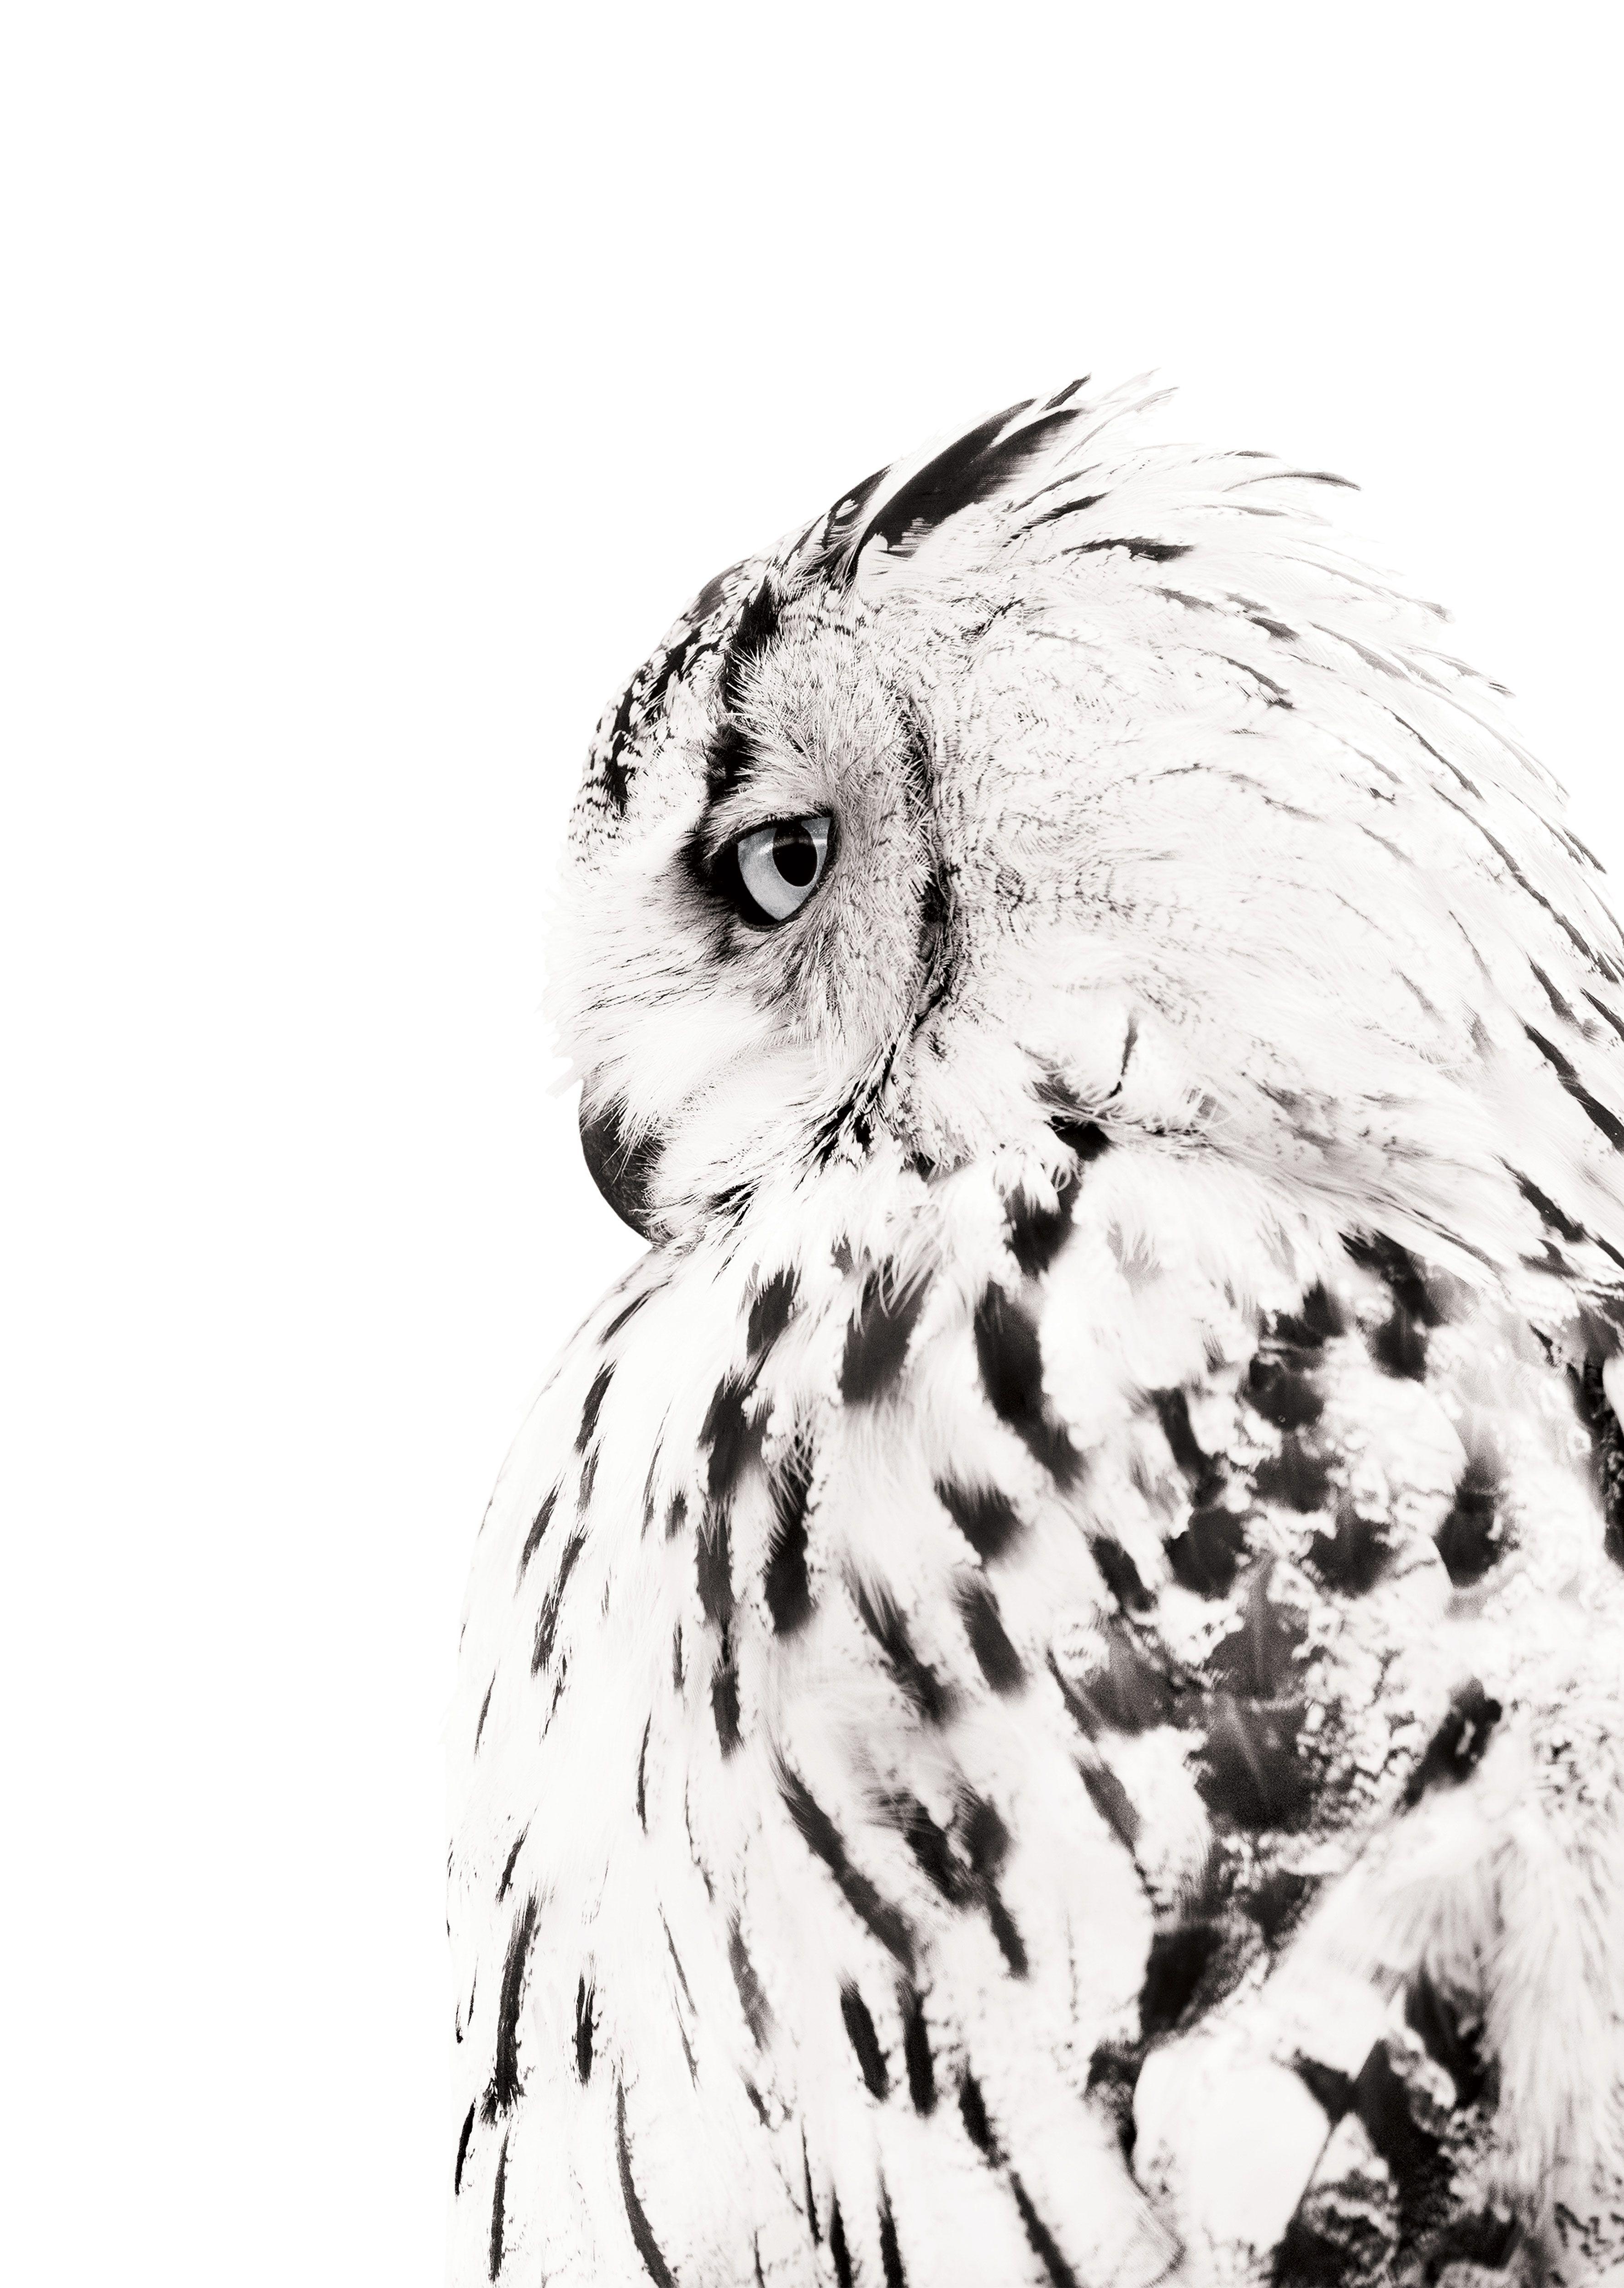 Black and white owl bird poster. Premium animal wall art